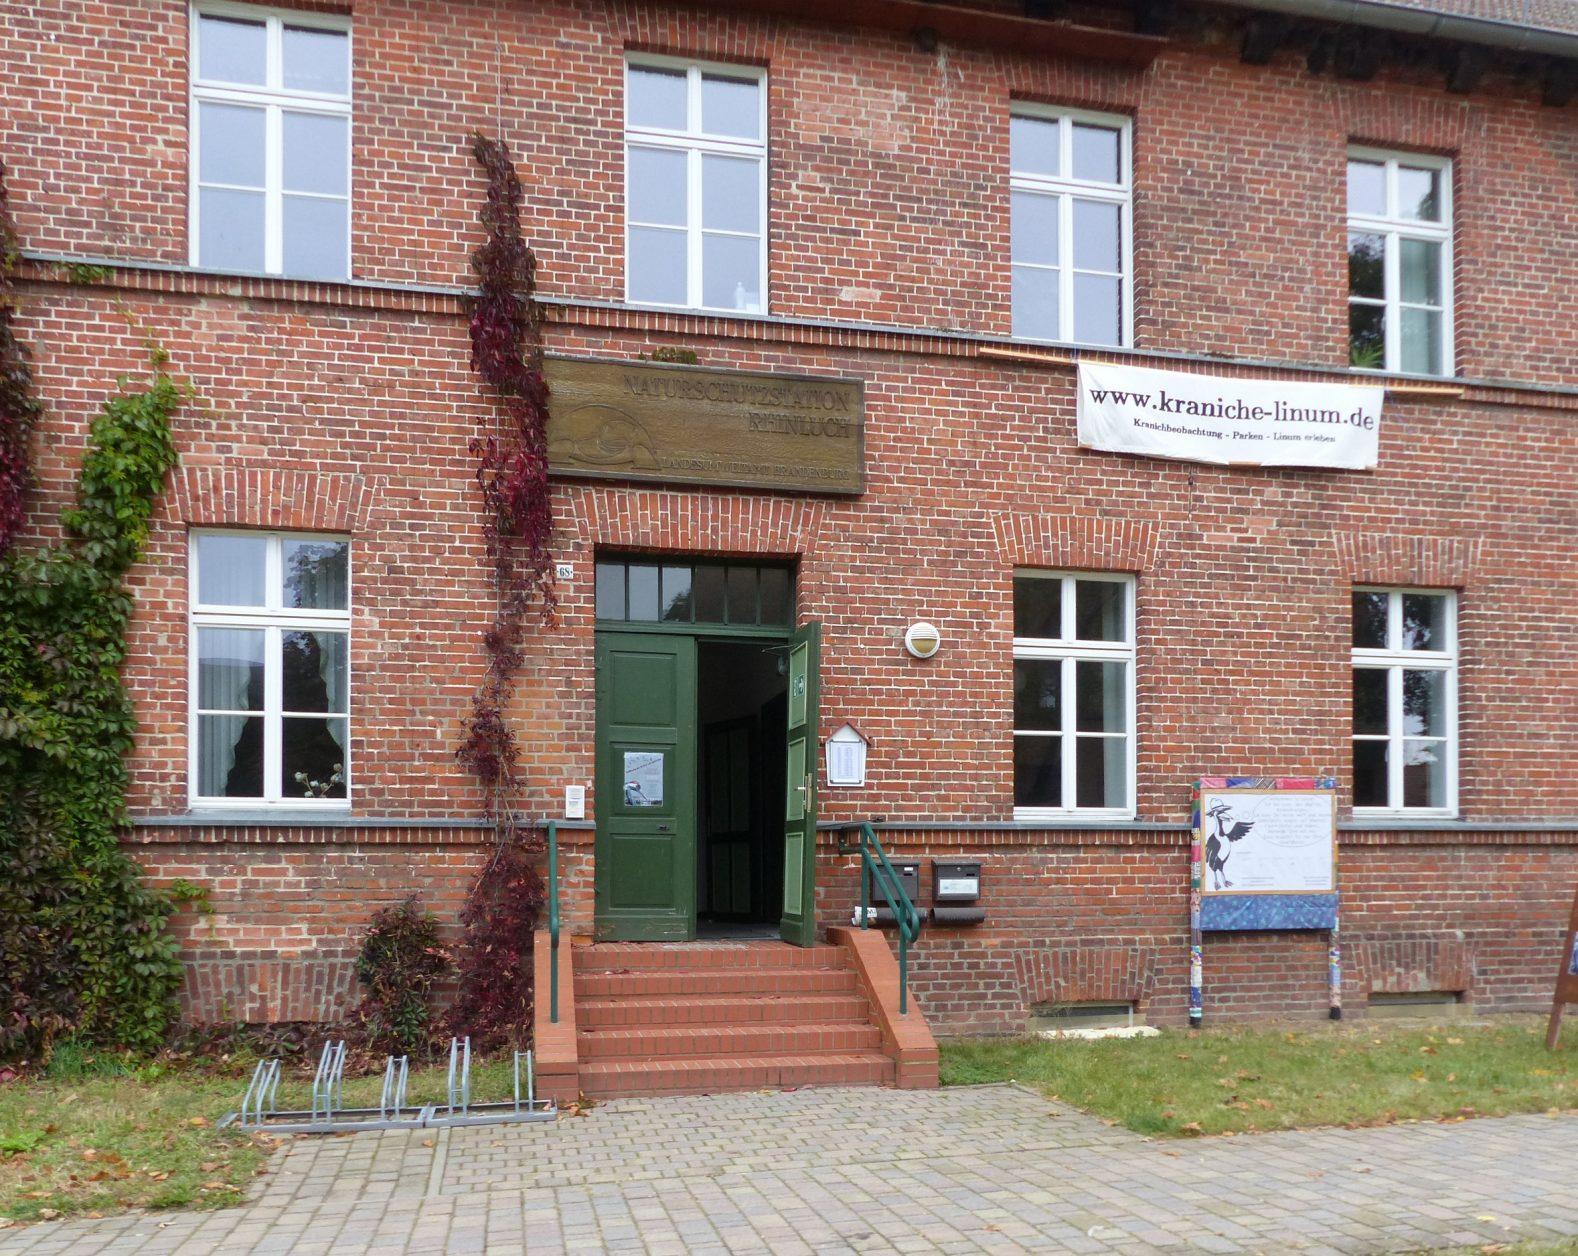 Naturschutzstation Rhinluch in Linum